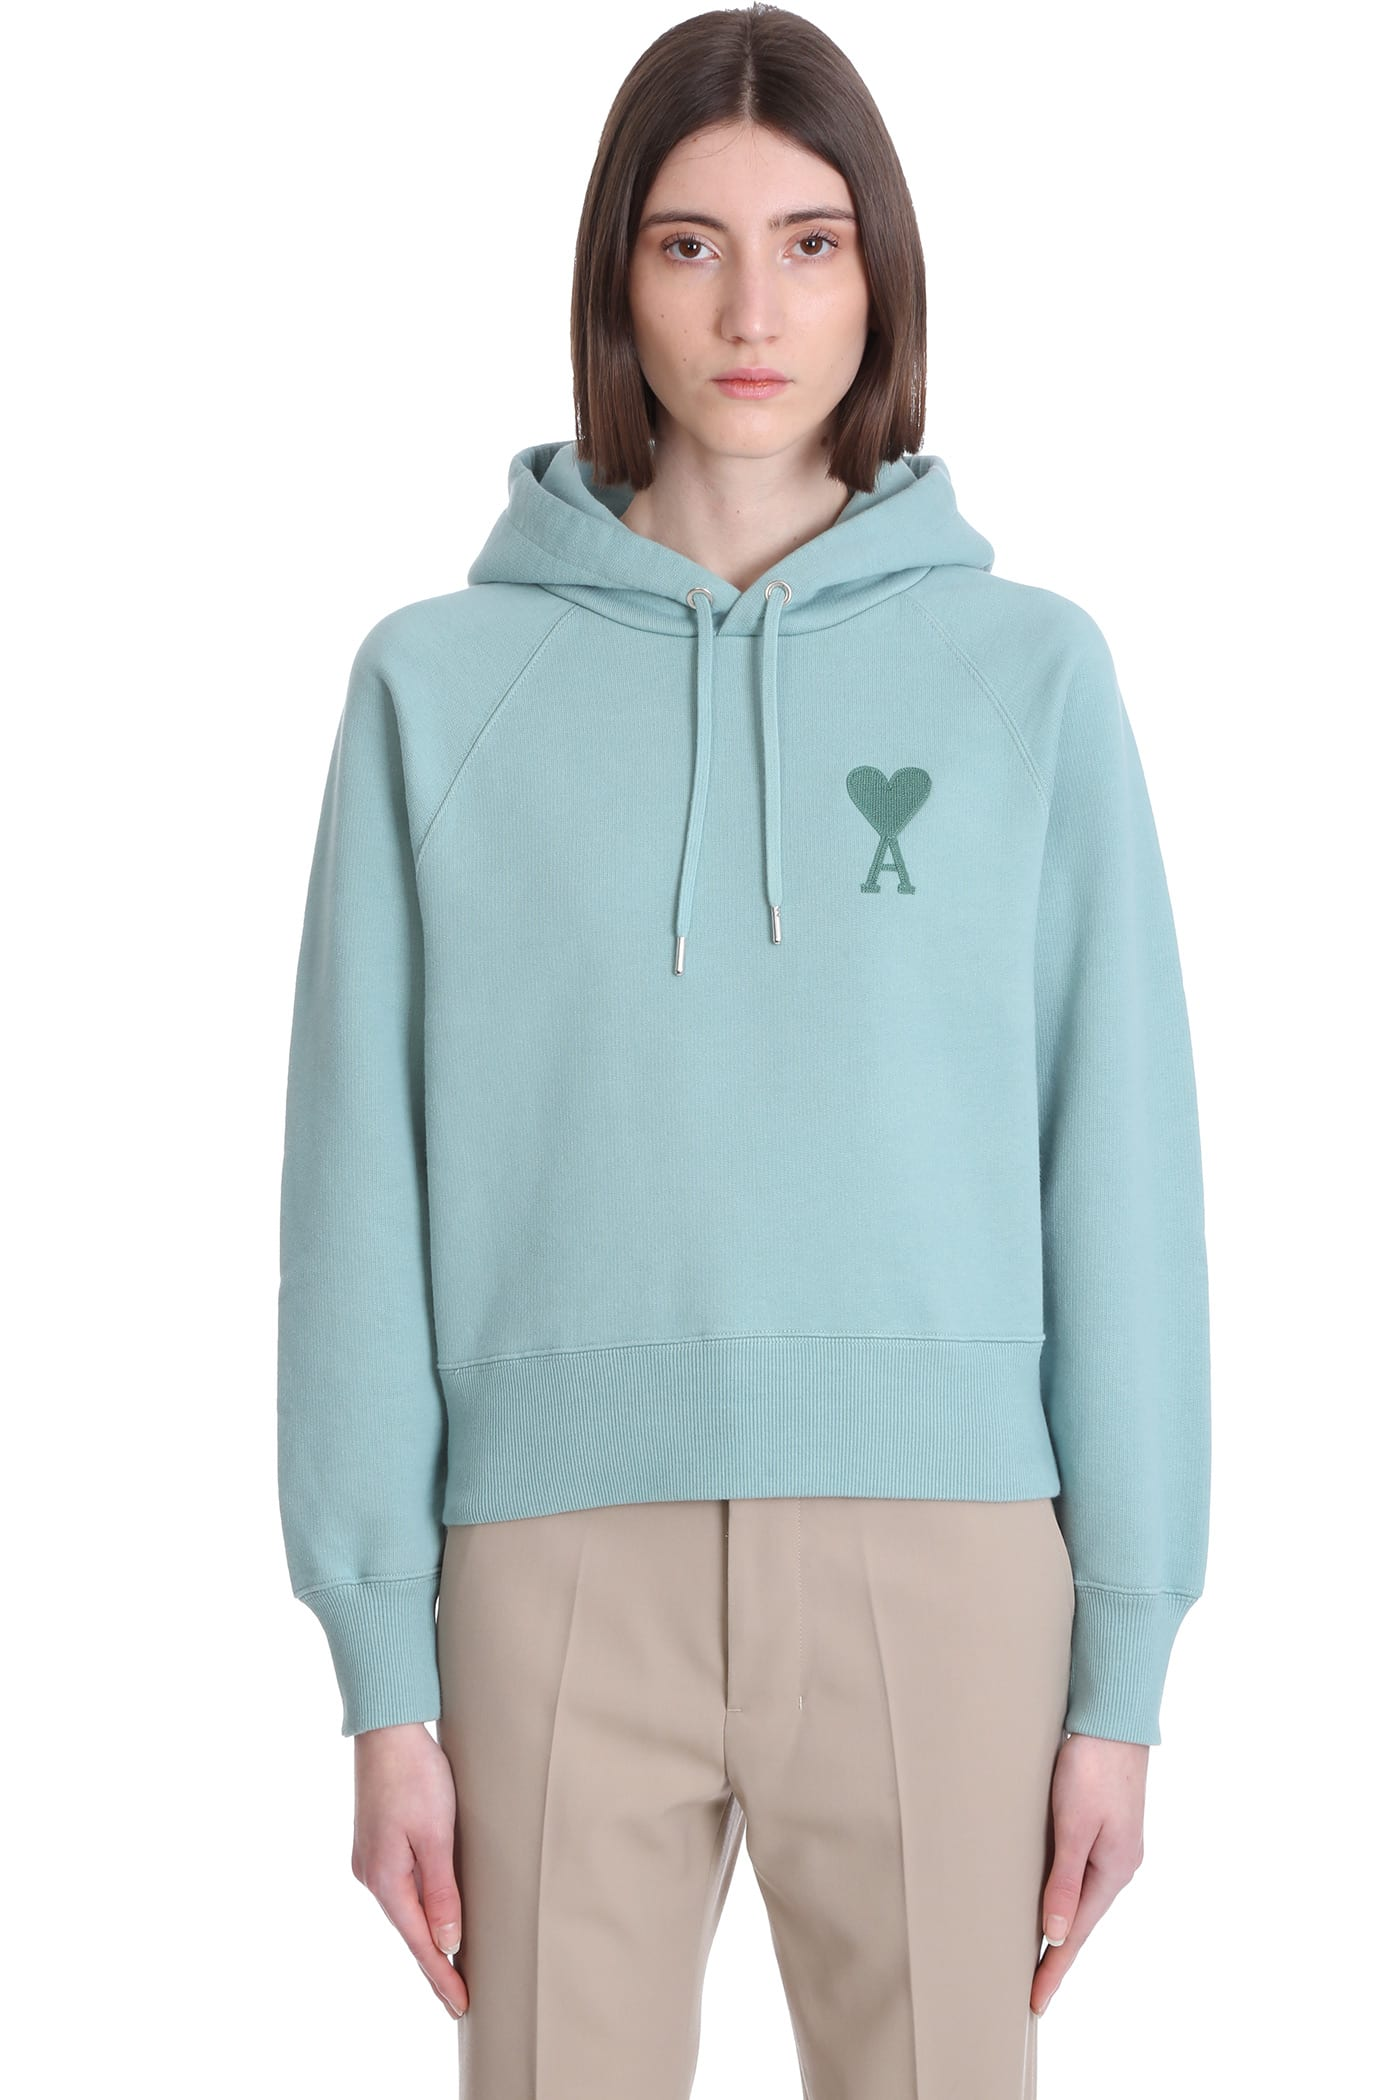 Ami Alexandre Mattiussi Sweatshirt In Green Cotton